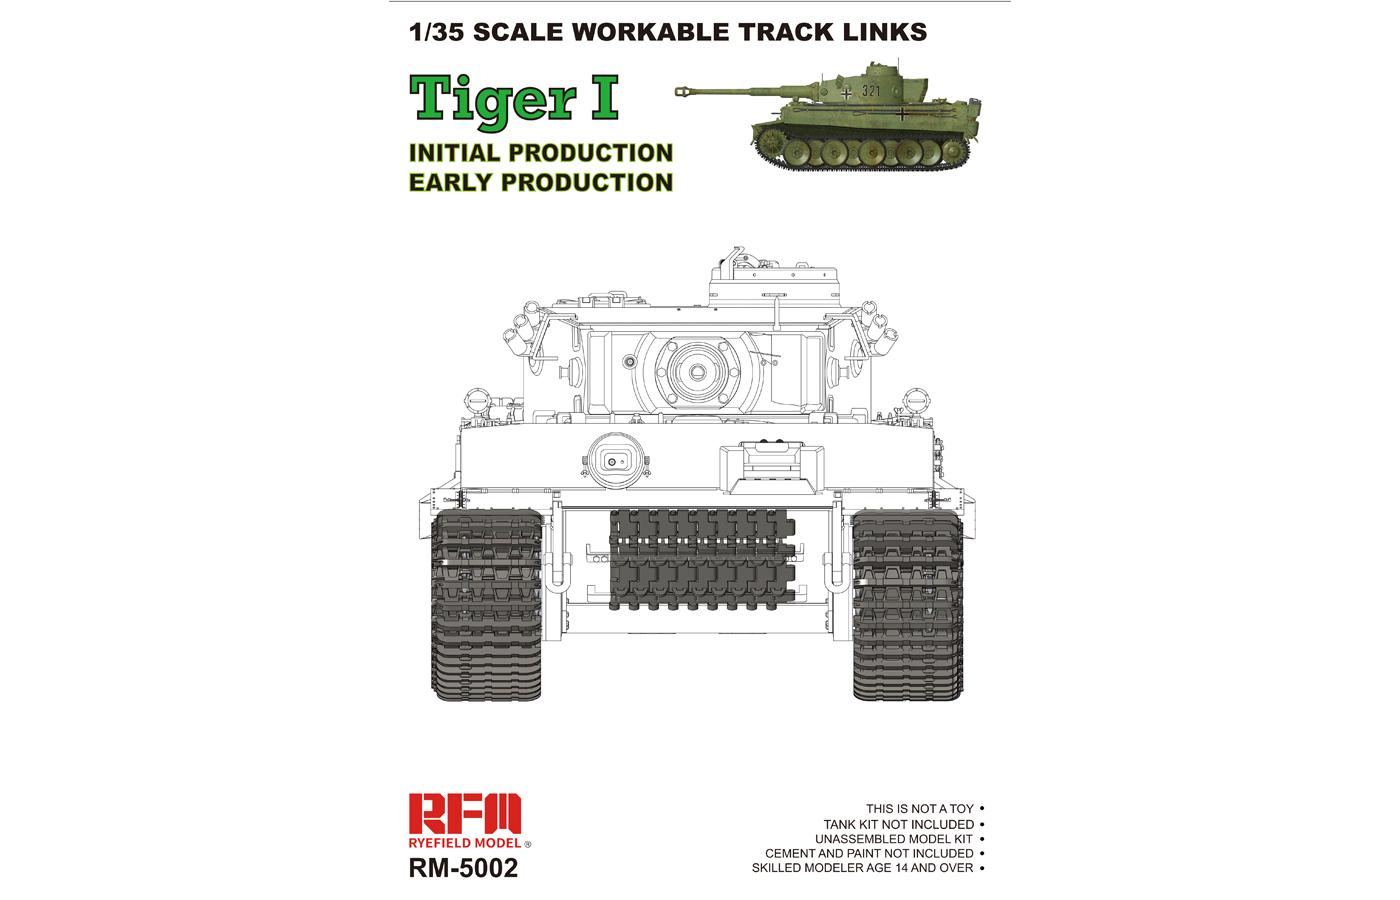 RM-5002 WORKABLE TRACKS FOR TIGER I